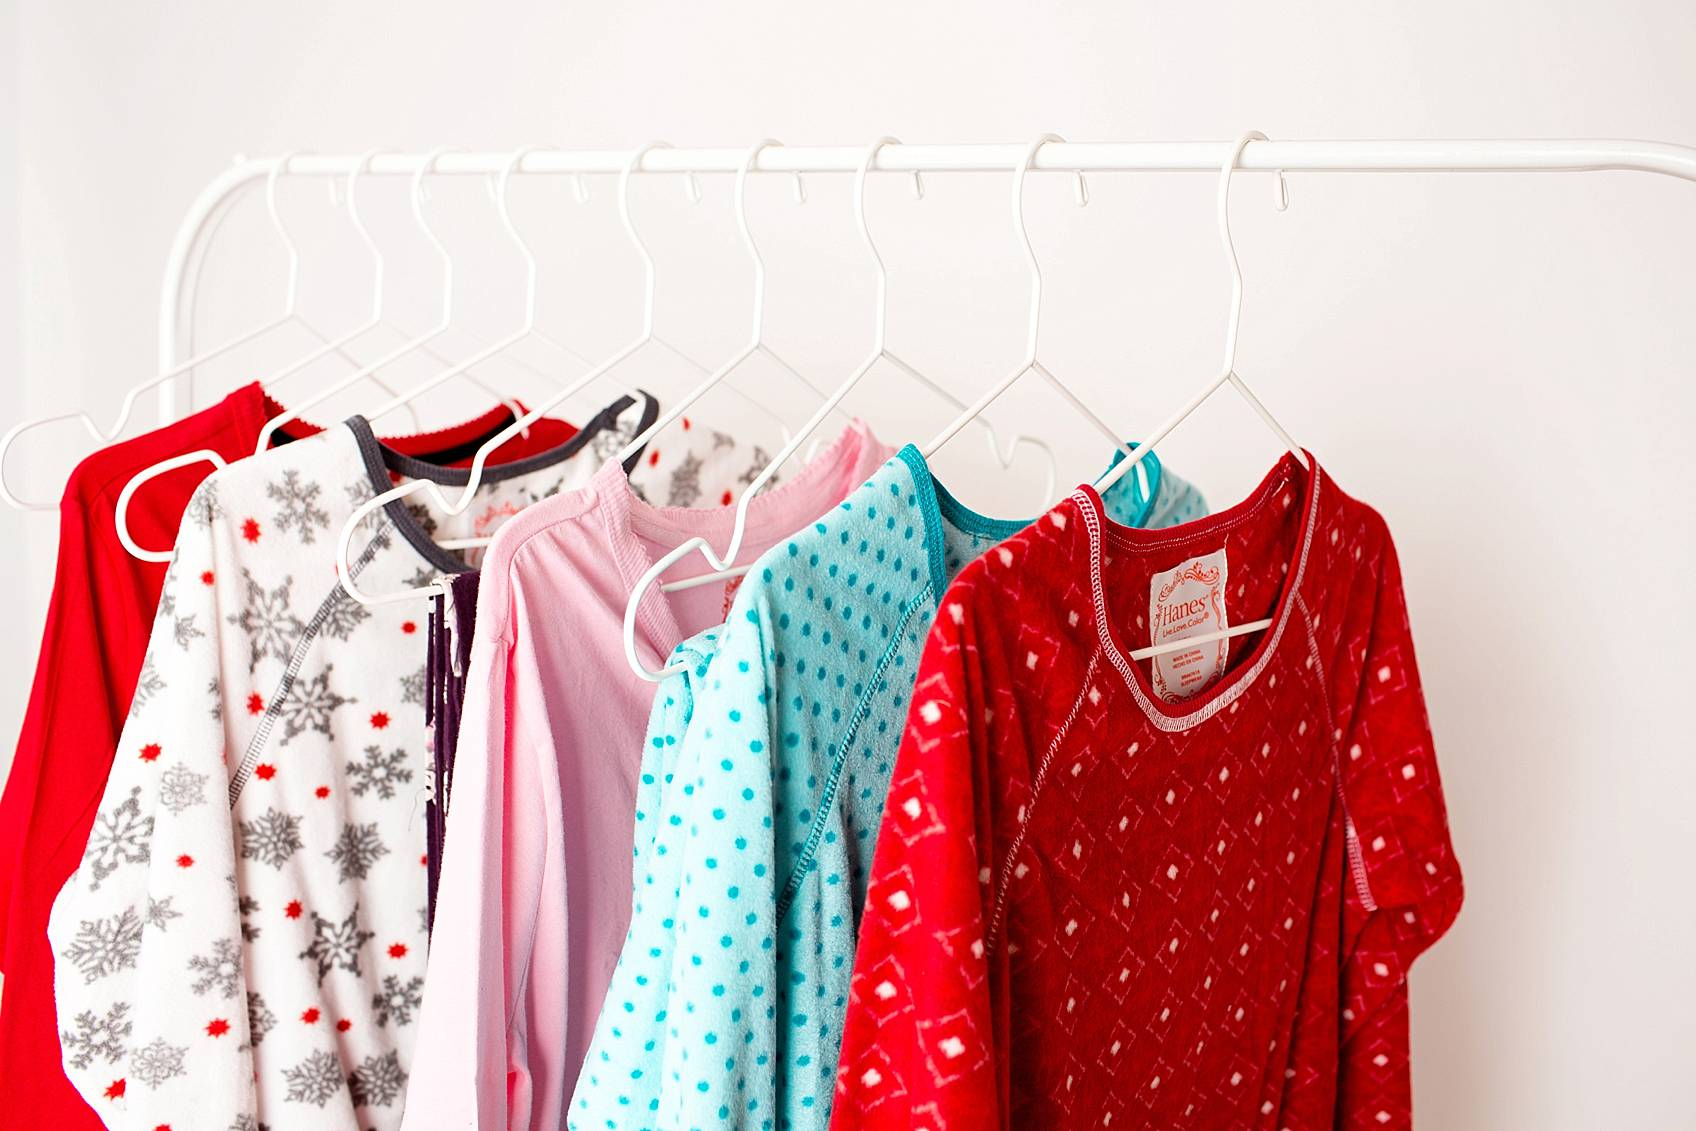 photo studio work in phoenix arizona pajamas hanging on Ikea hanger